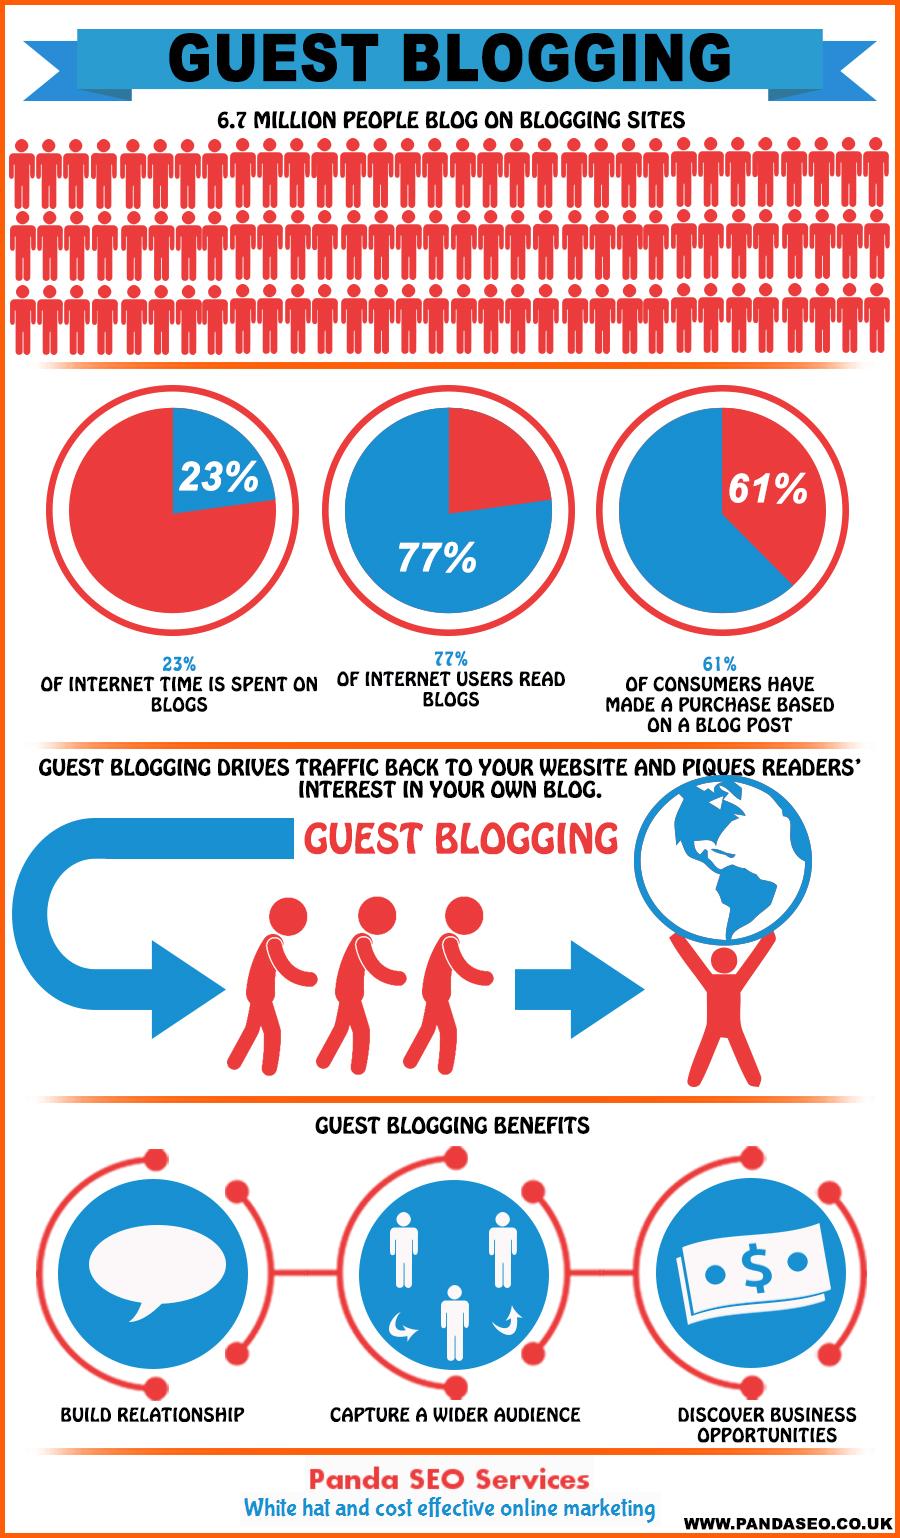 guest-blogging-benefits_525a705d265d7